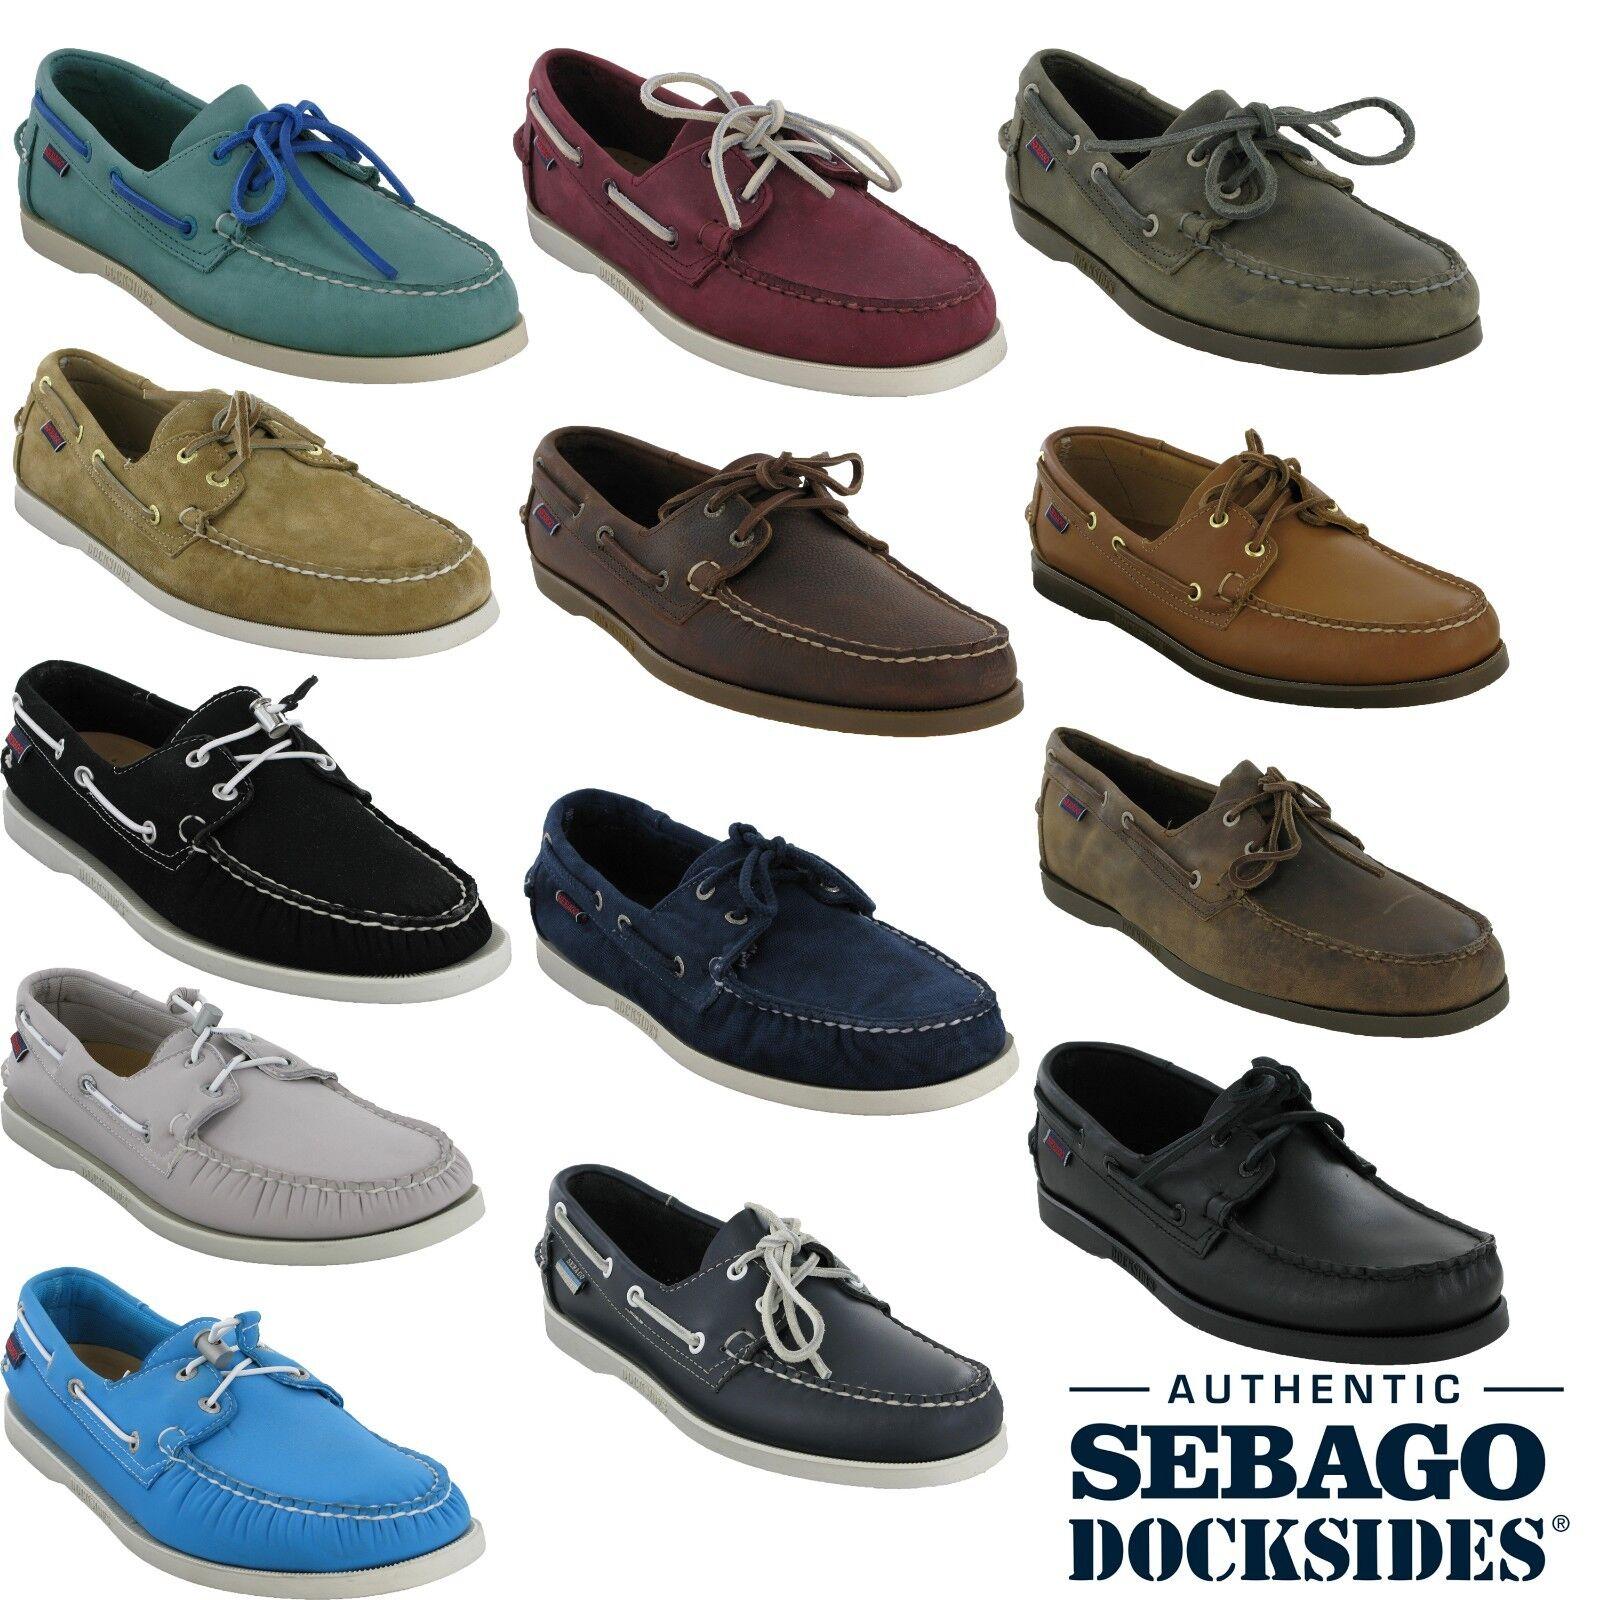 Sebago Docksides Mens Leather Nubuck Lace Smart Casual Ariaprene  Loafer schuhe